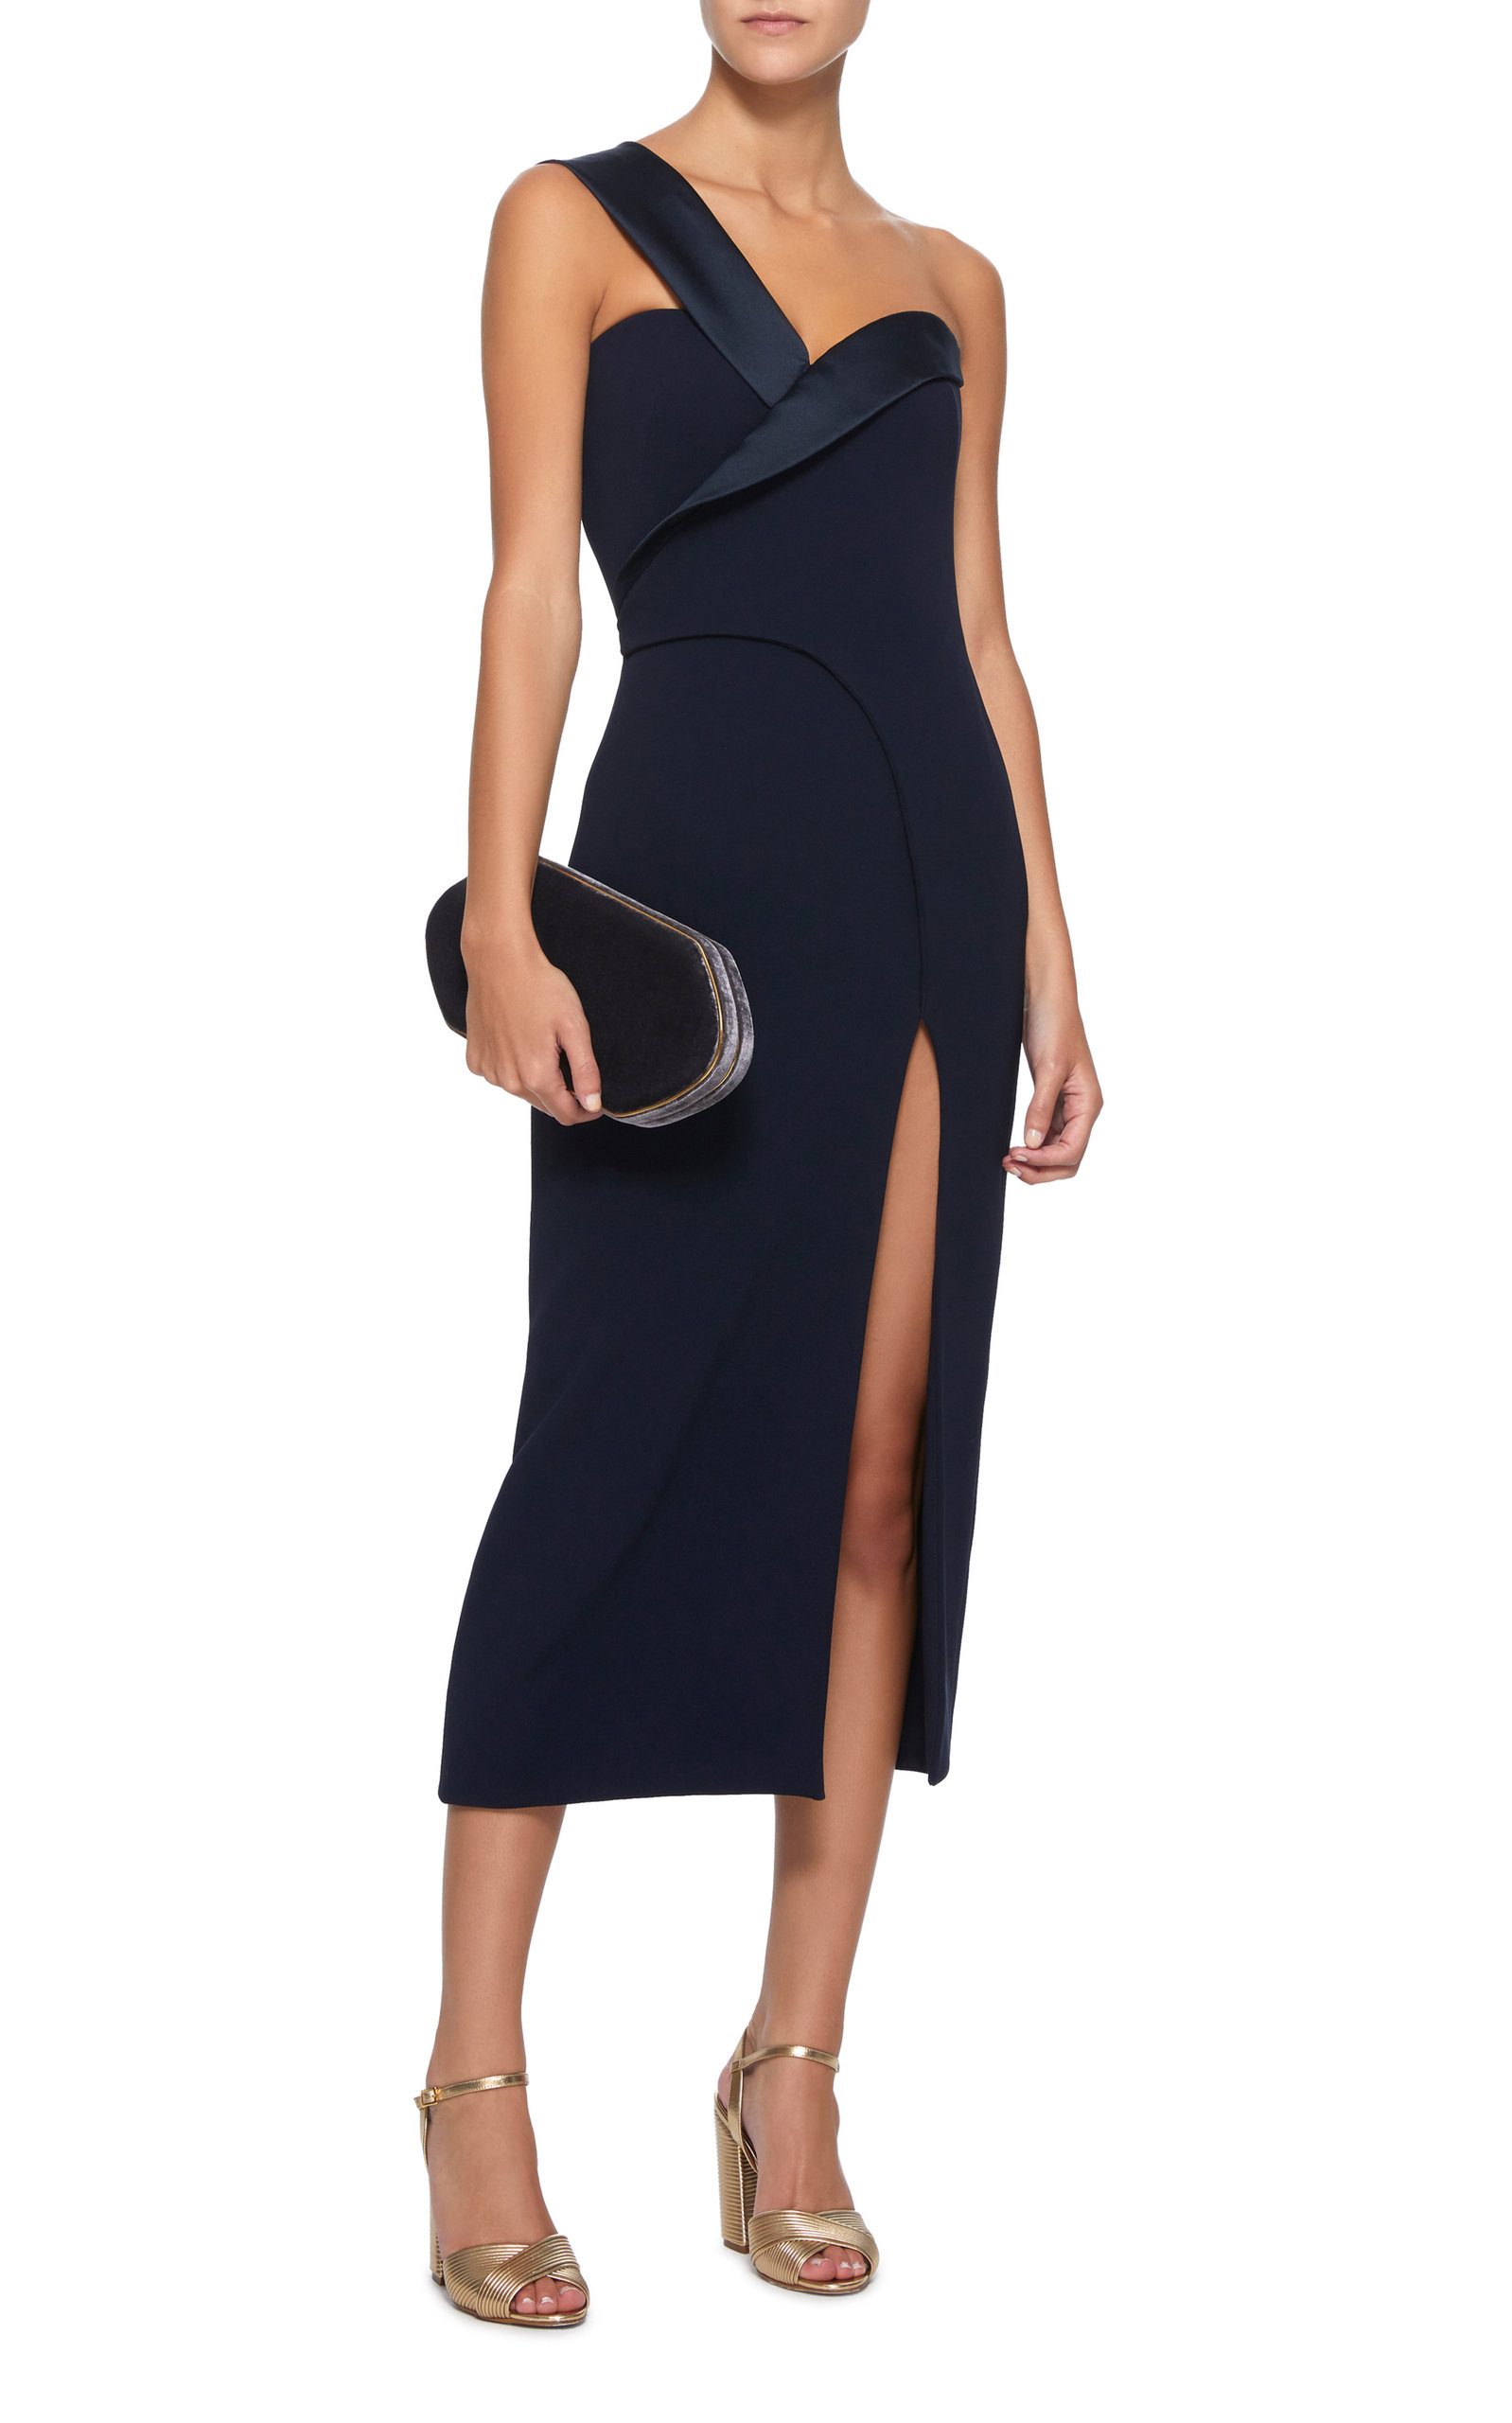 9025f0b2e79 Satin-Trimmed One-Shoulder Midi Dress by BRANDON MAXWELL Now Available on Moda  Operandi